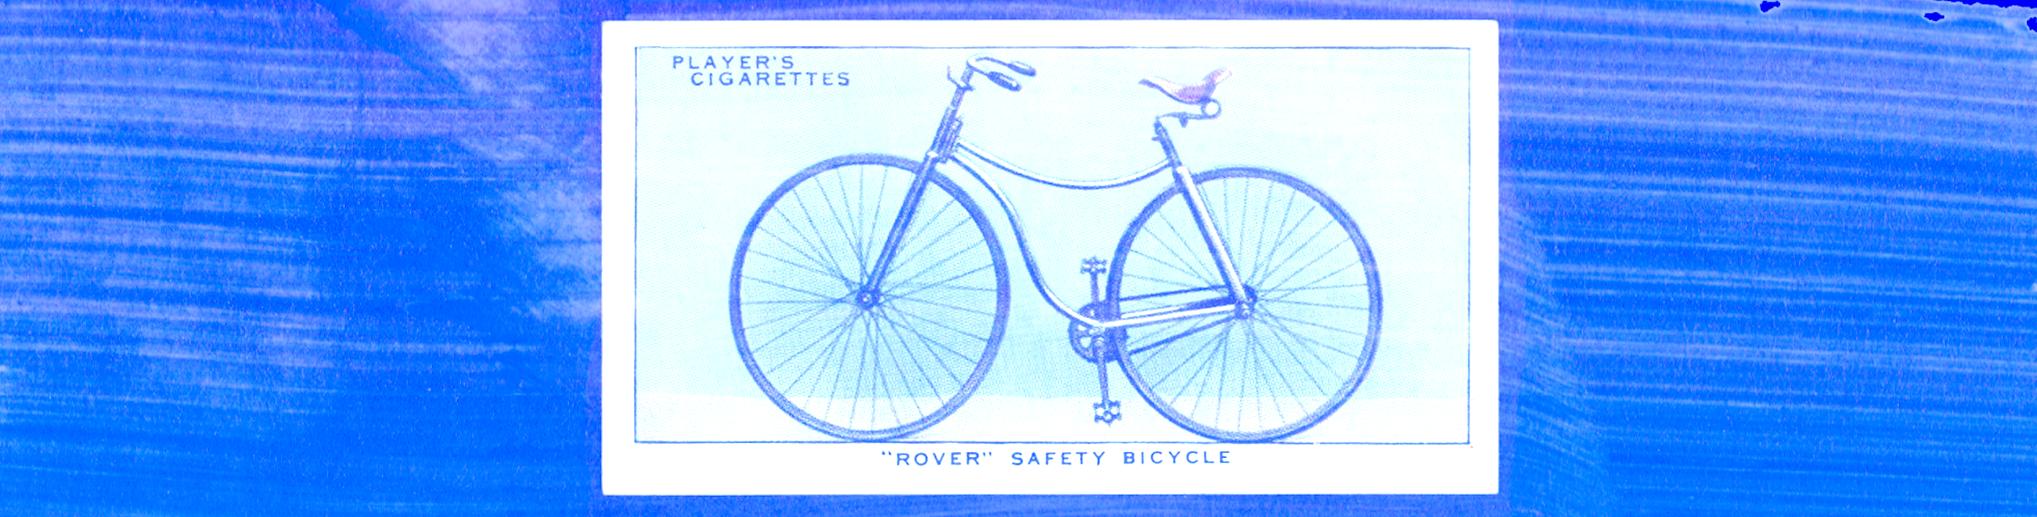 bicicleta plagio shakira